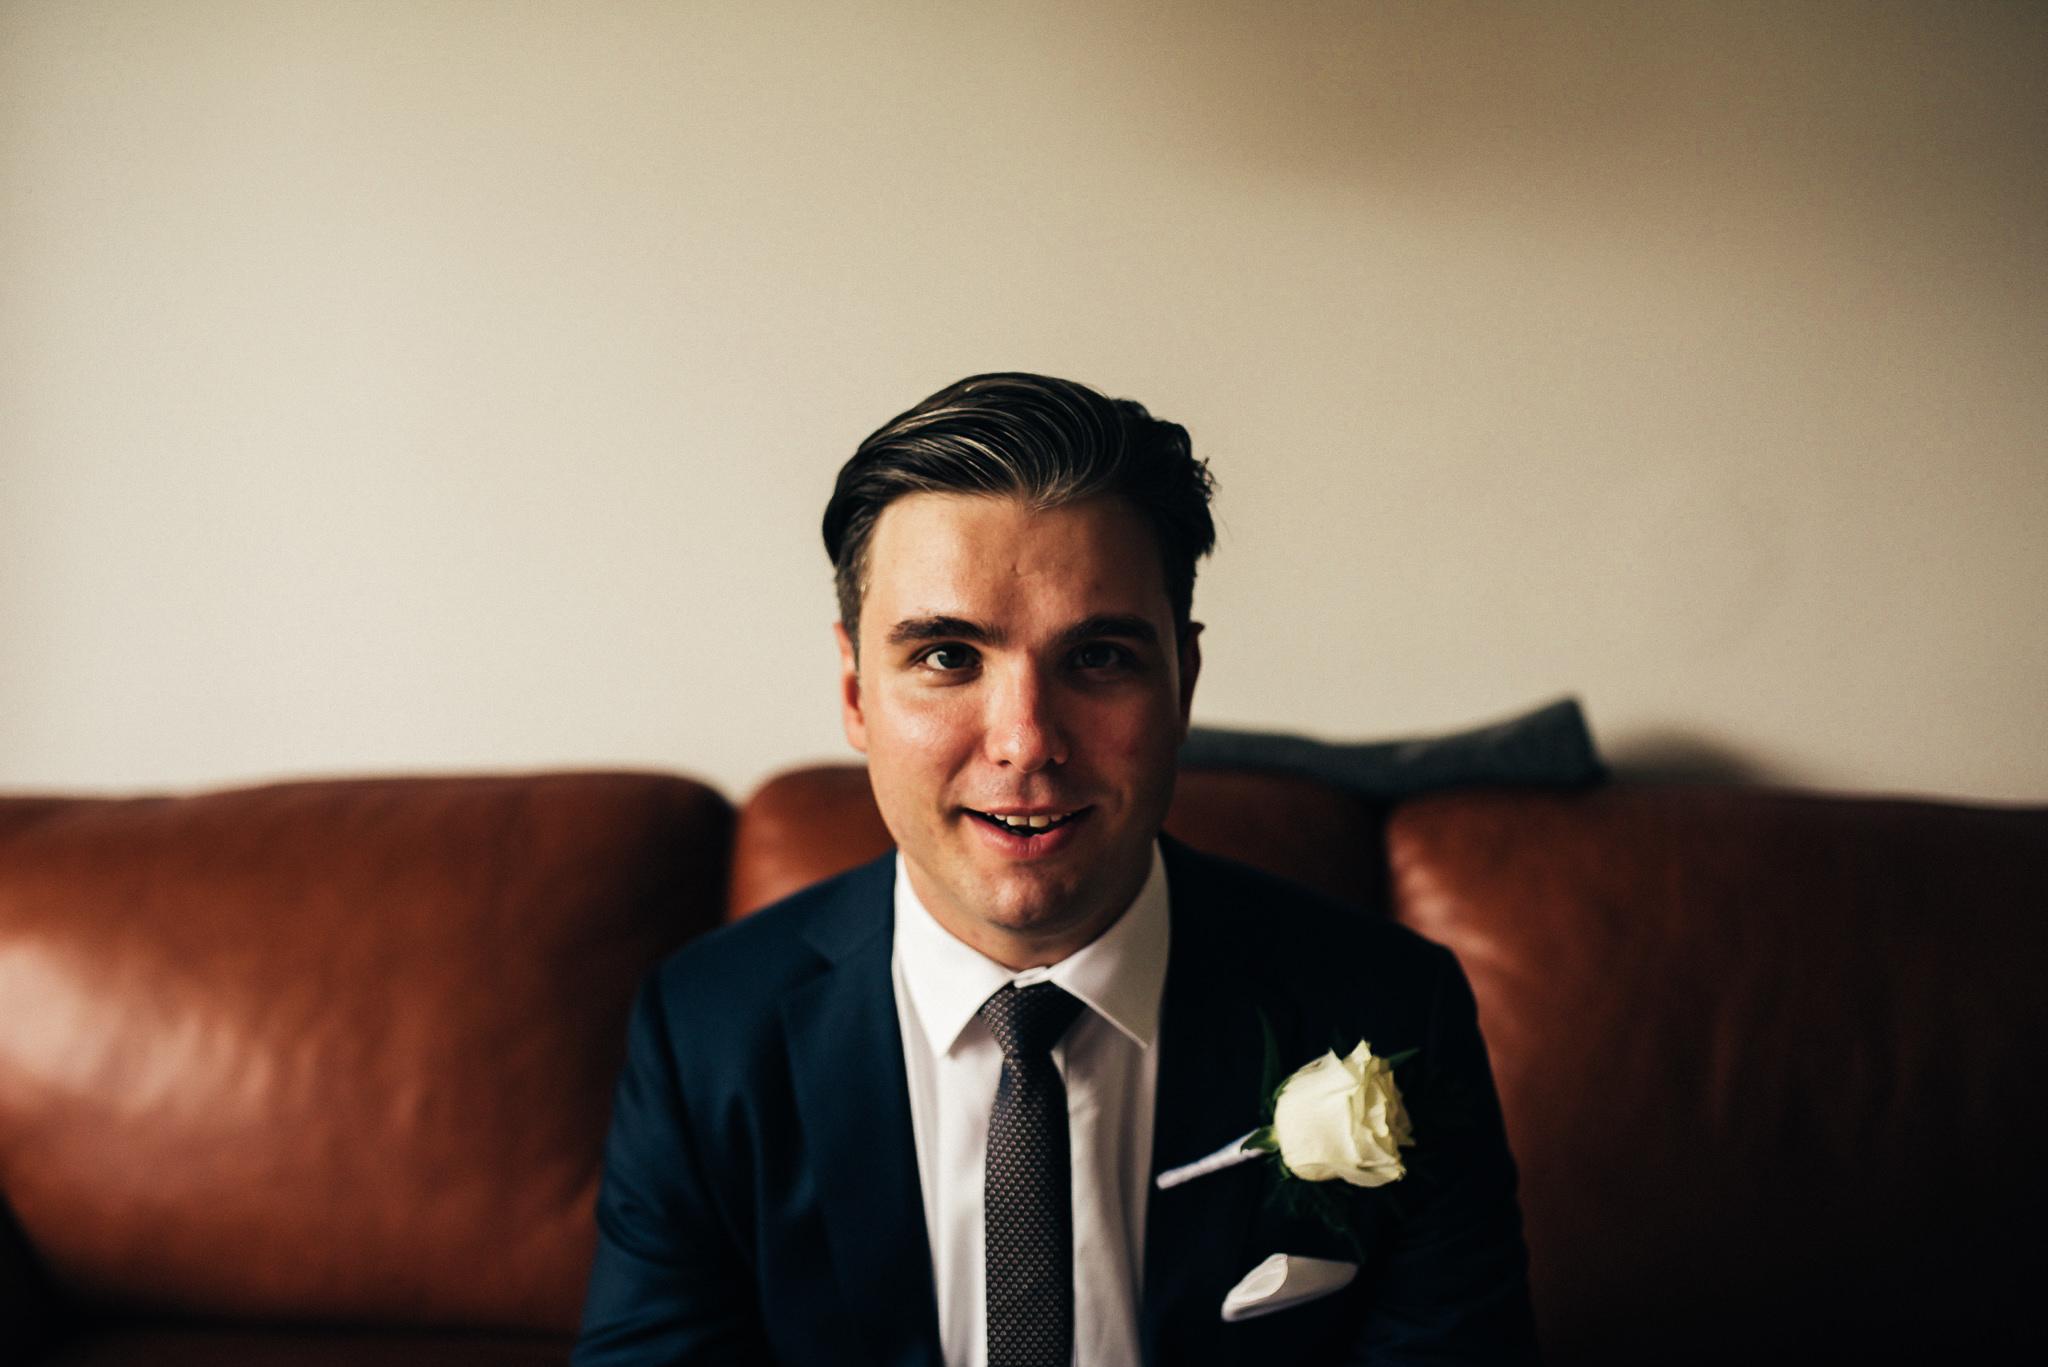 Byron Bay Wedding Photographer (37 of 230).jpg